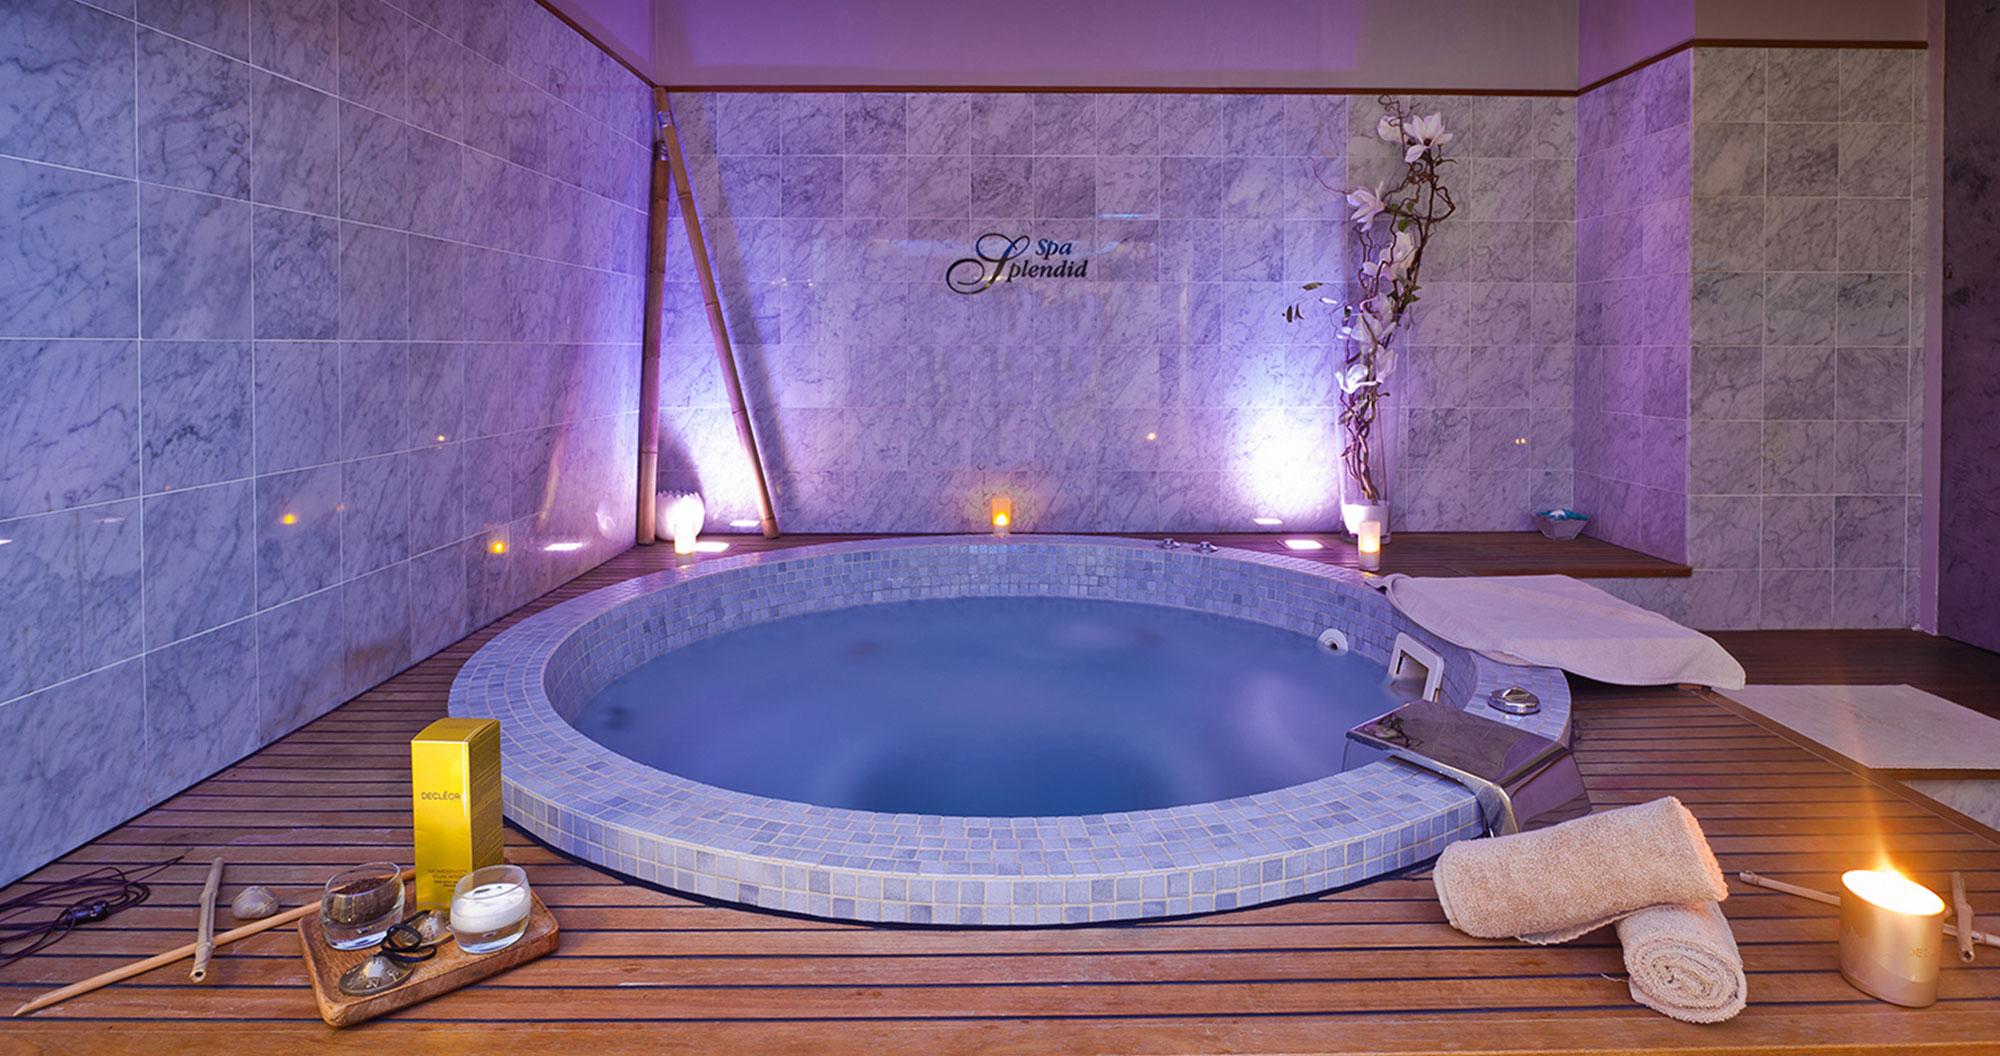 Splendid Hotel And Spa Nice